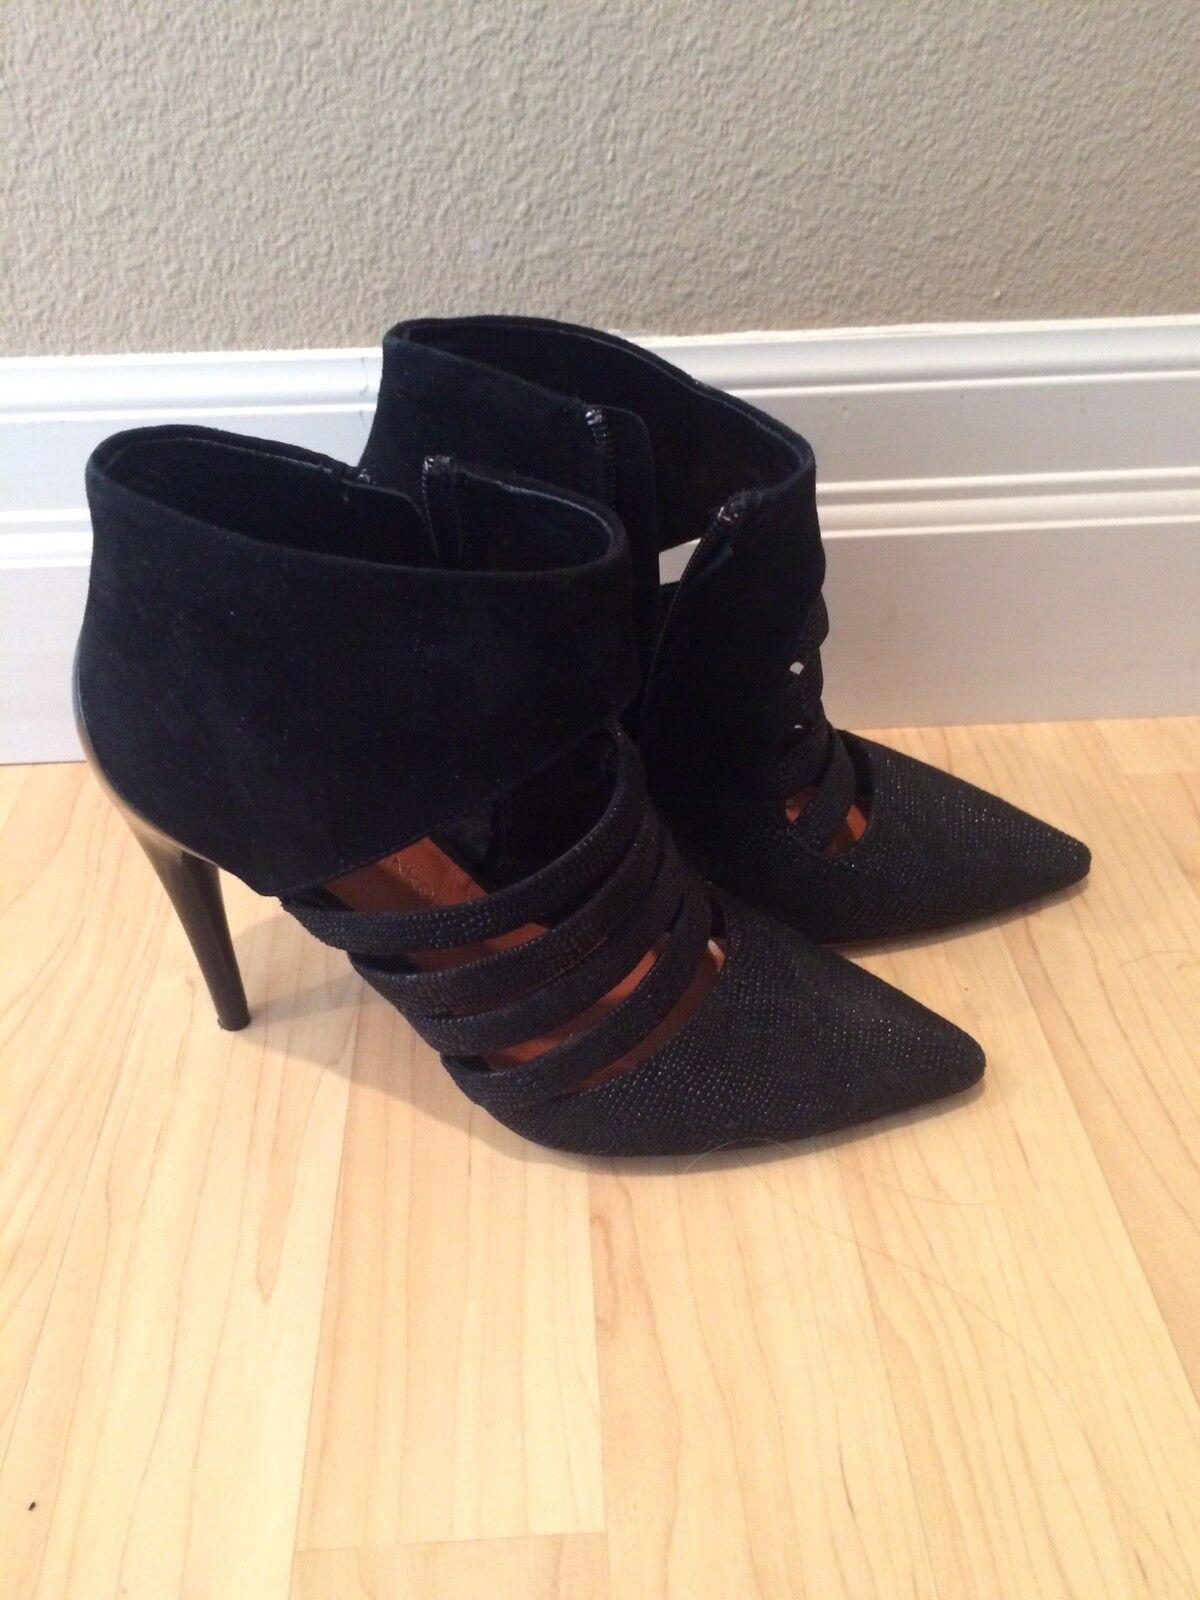 Men's/Women's rebecca minkoff ankle booties 6 Aesthetic appearance Clearance TRUE